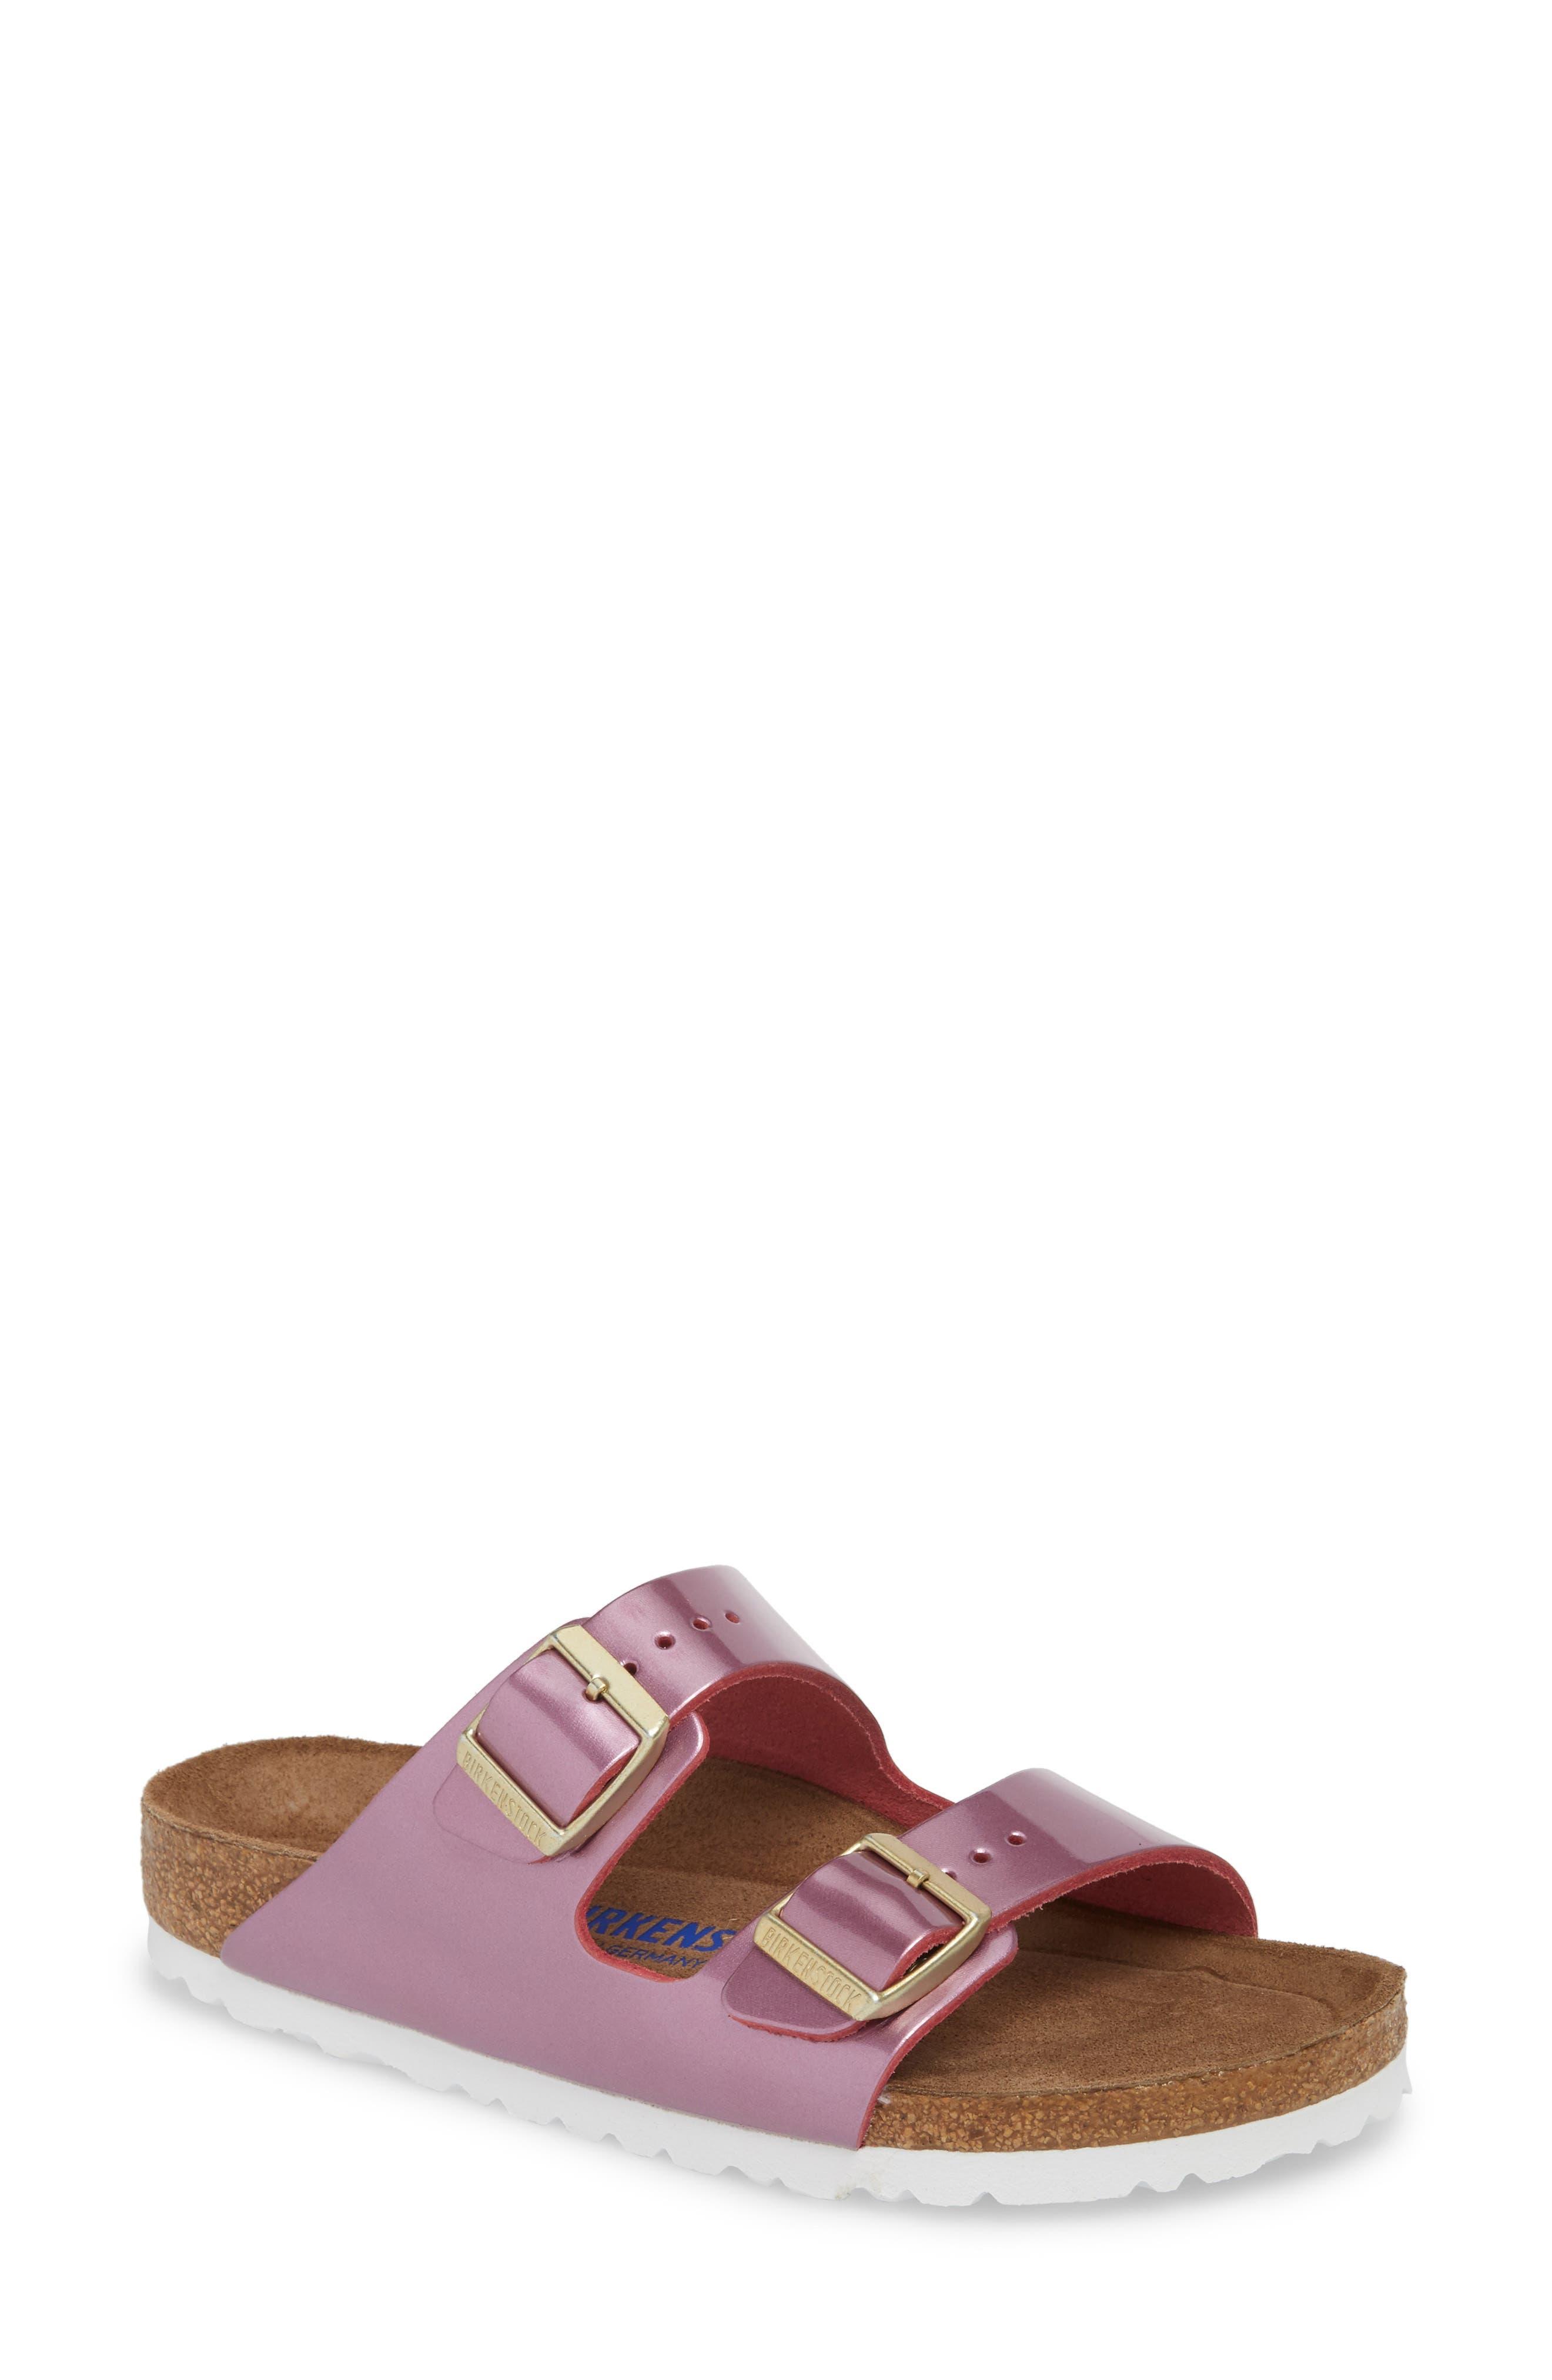 'Arizona' Soft Footbed Sandal,                             Main thumbnail 1, color,                             Spectacular Rose Leather